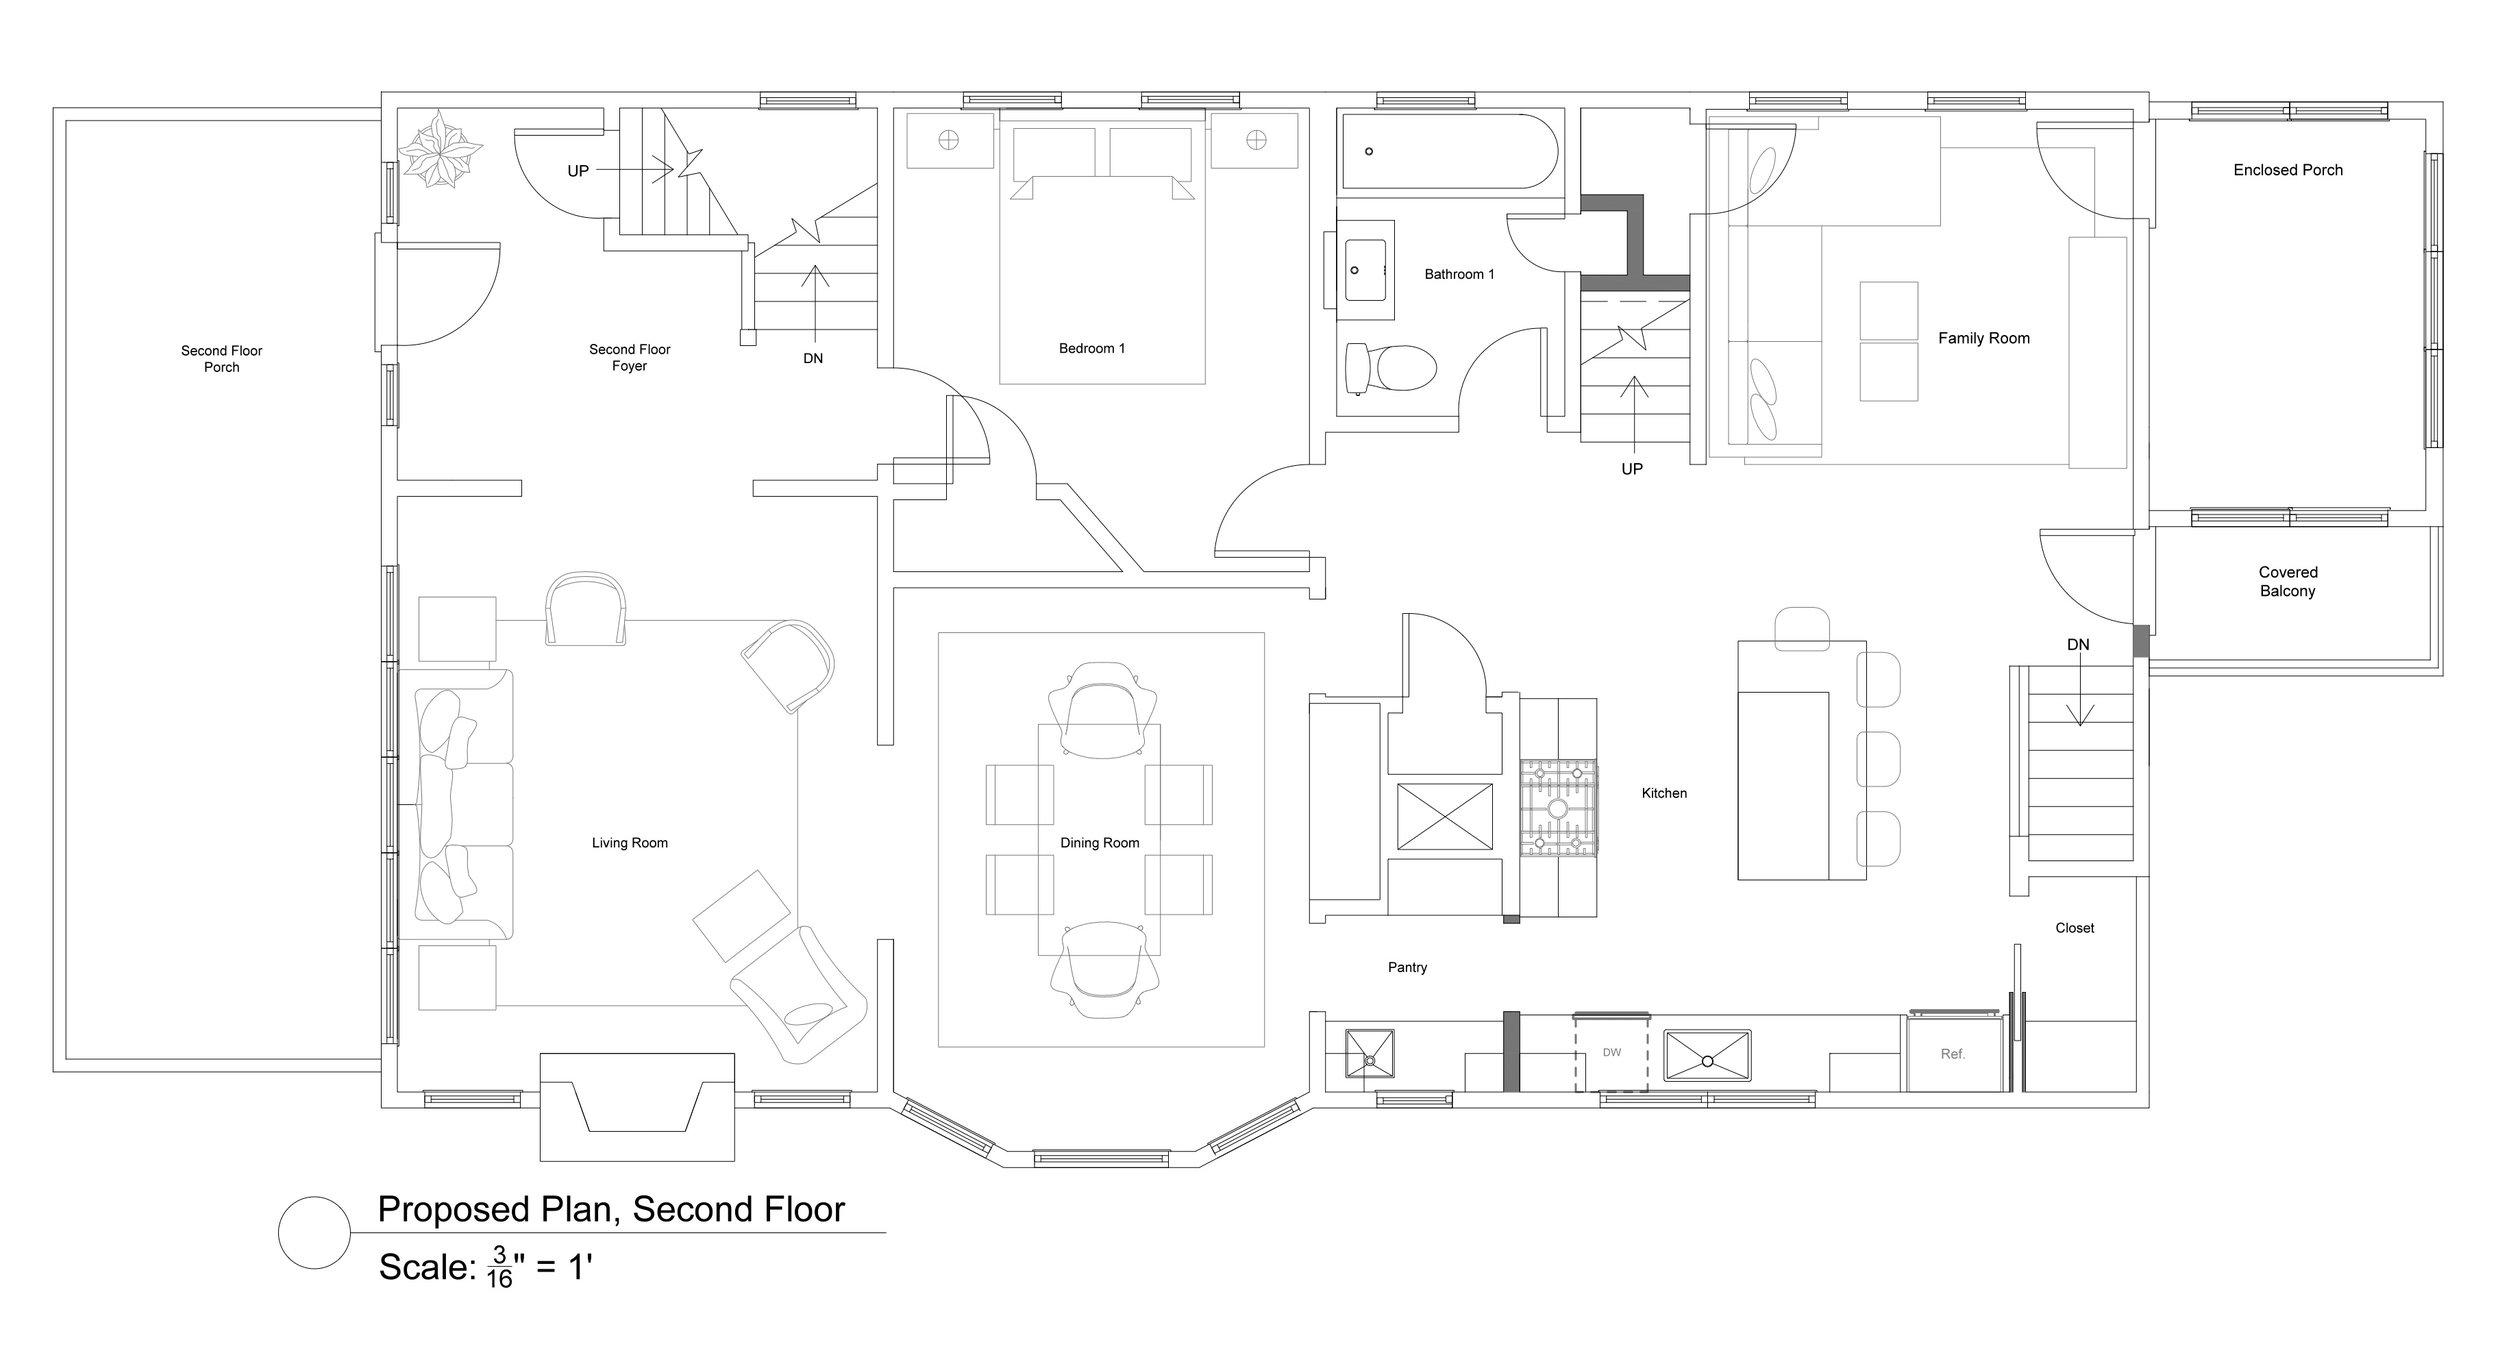 5 Second Floor Proposed.jpg